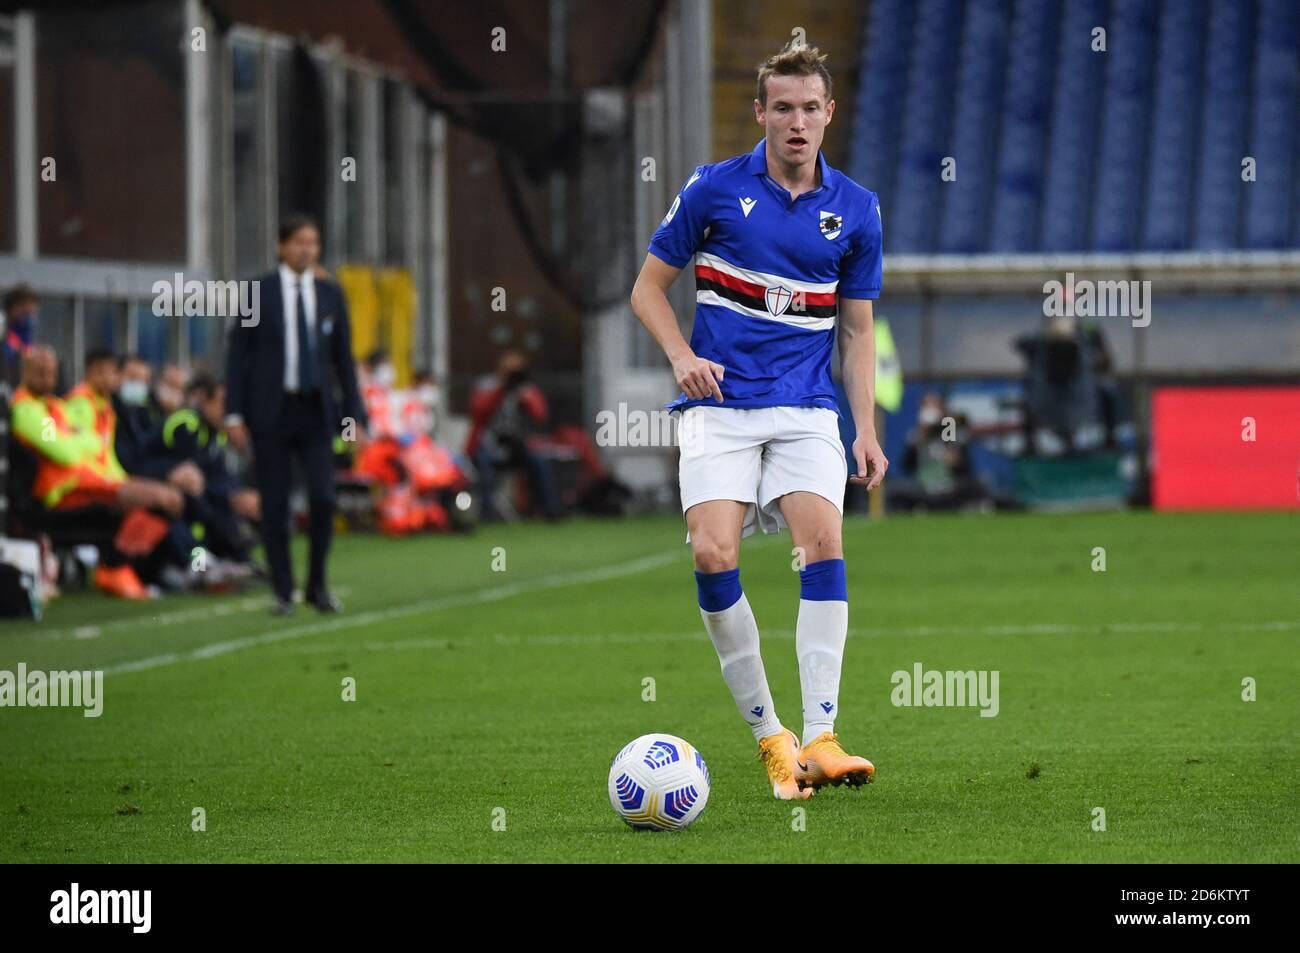 AKUB JANKTO (Sampdoria) während Sampdoria vs SS Lazio , italienische Fußball Serie A Spiel, Genua, Italien, 17 Oct 2020 Credit: LM/Danilo Vigo Stockfoto